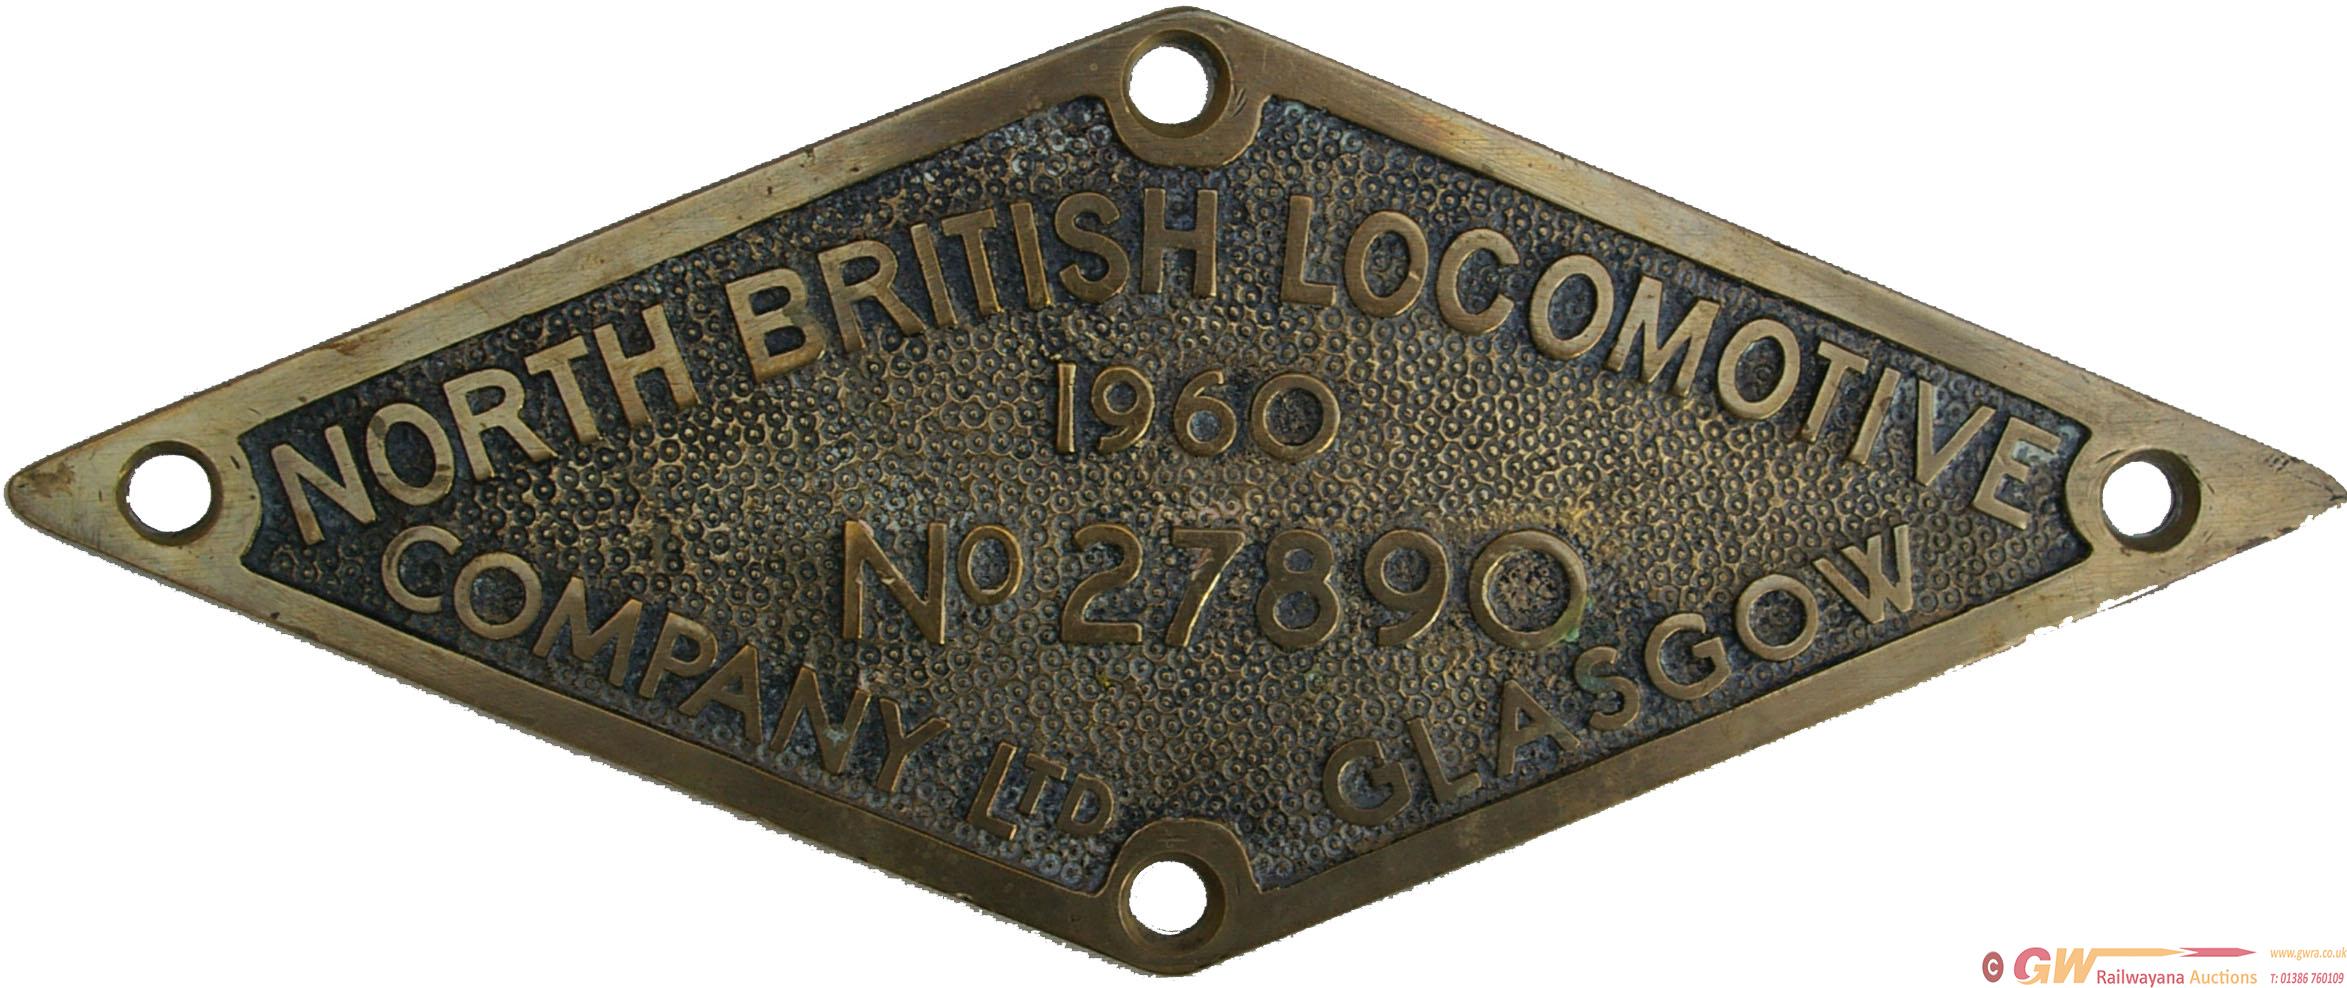 Worksplate, North British Locomotive Company Ltd.,